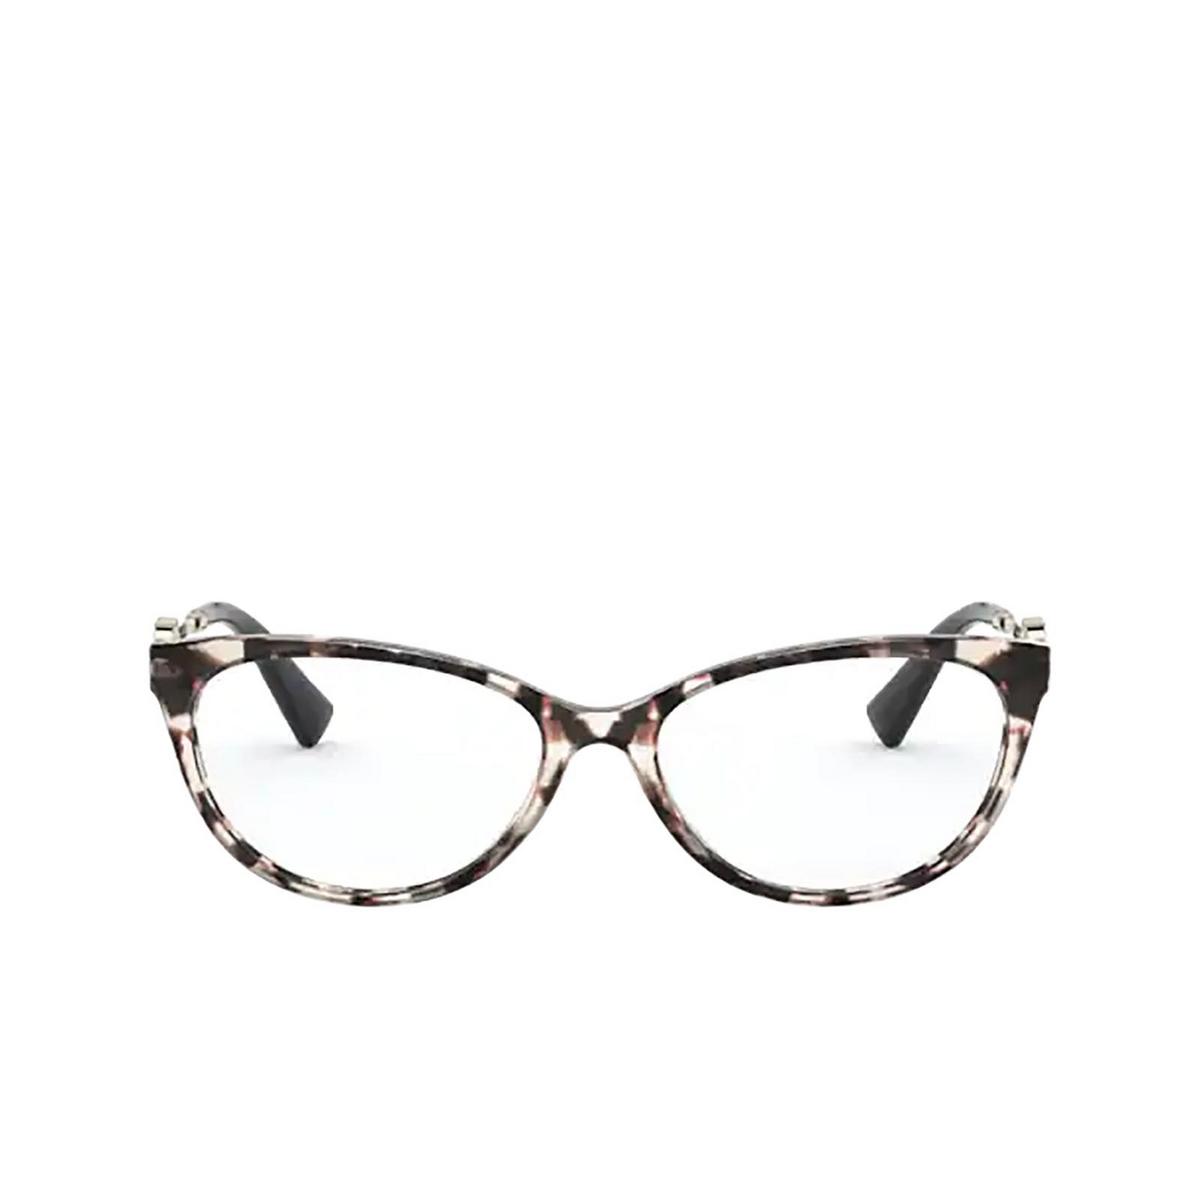 Valentino® Cat-eye Eyeglasses: VA3051 color Brown / Beige Tortoise 5097 - front view.